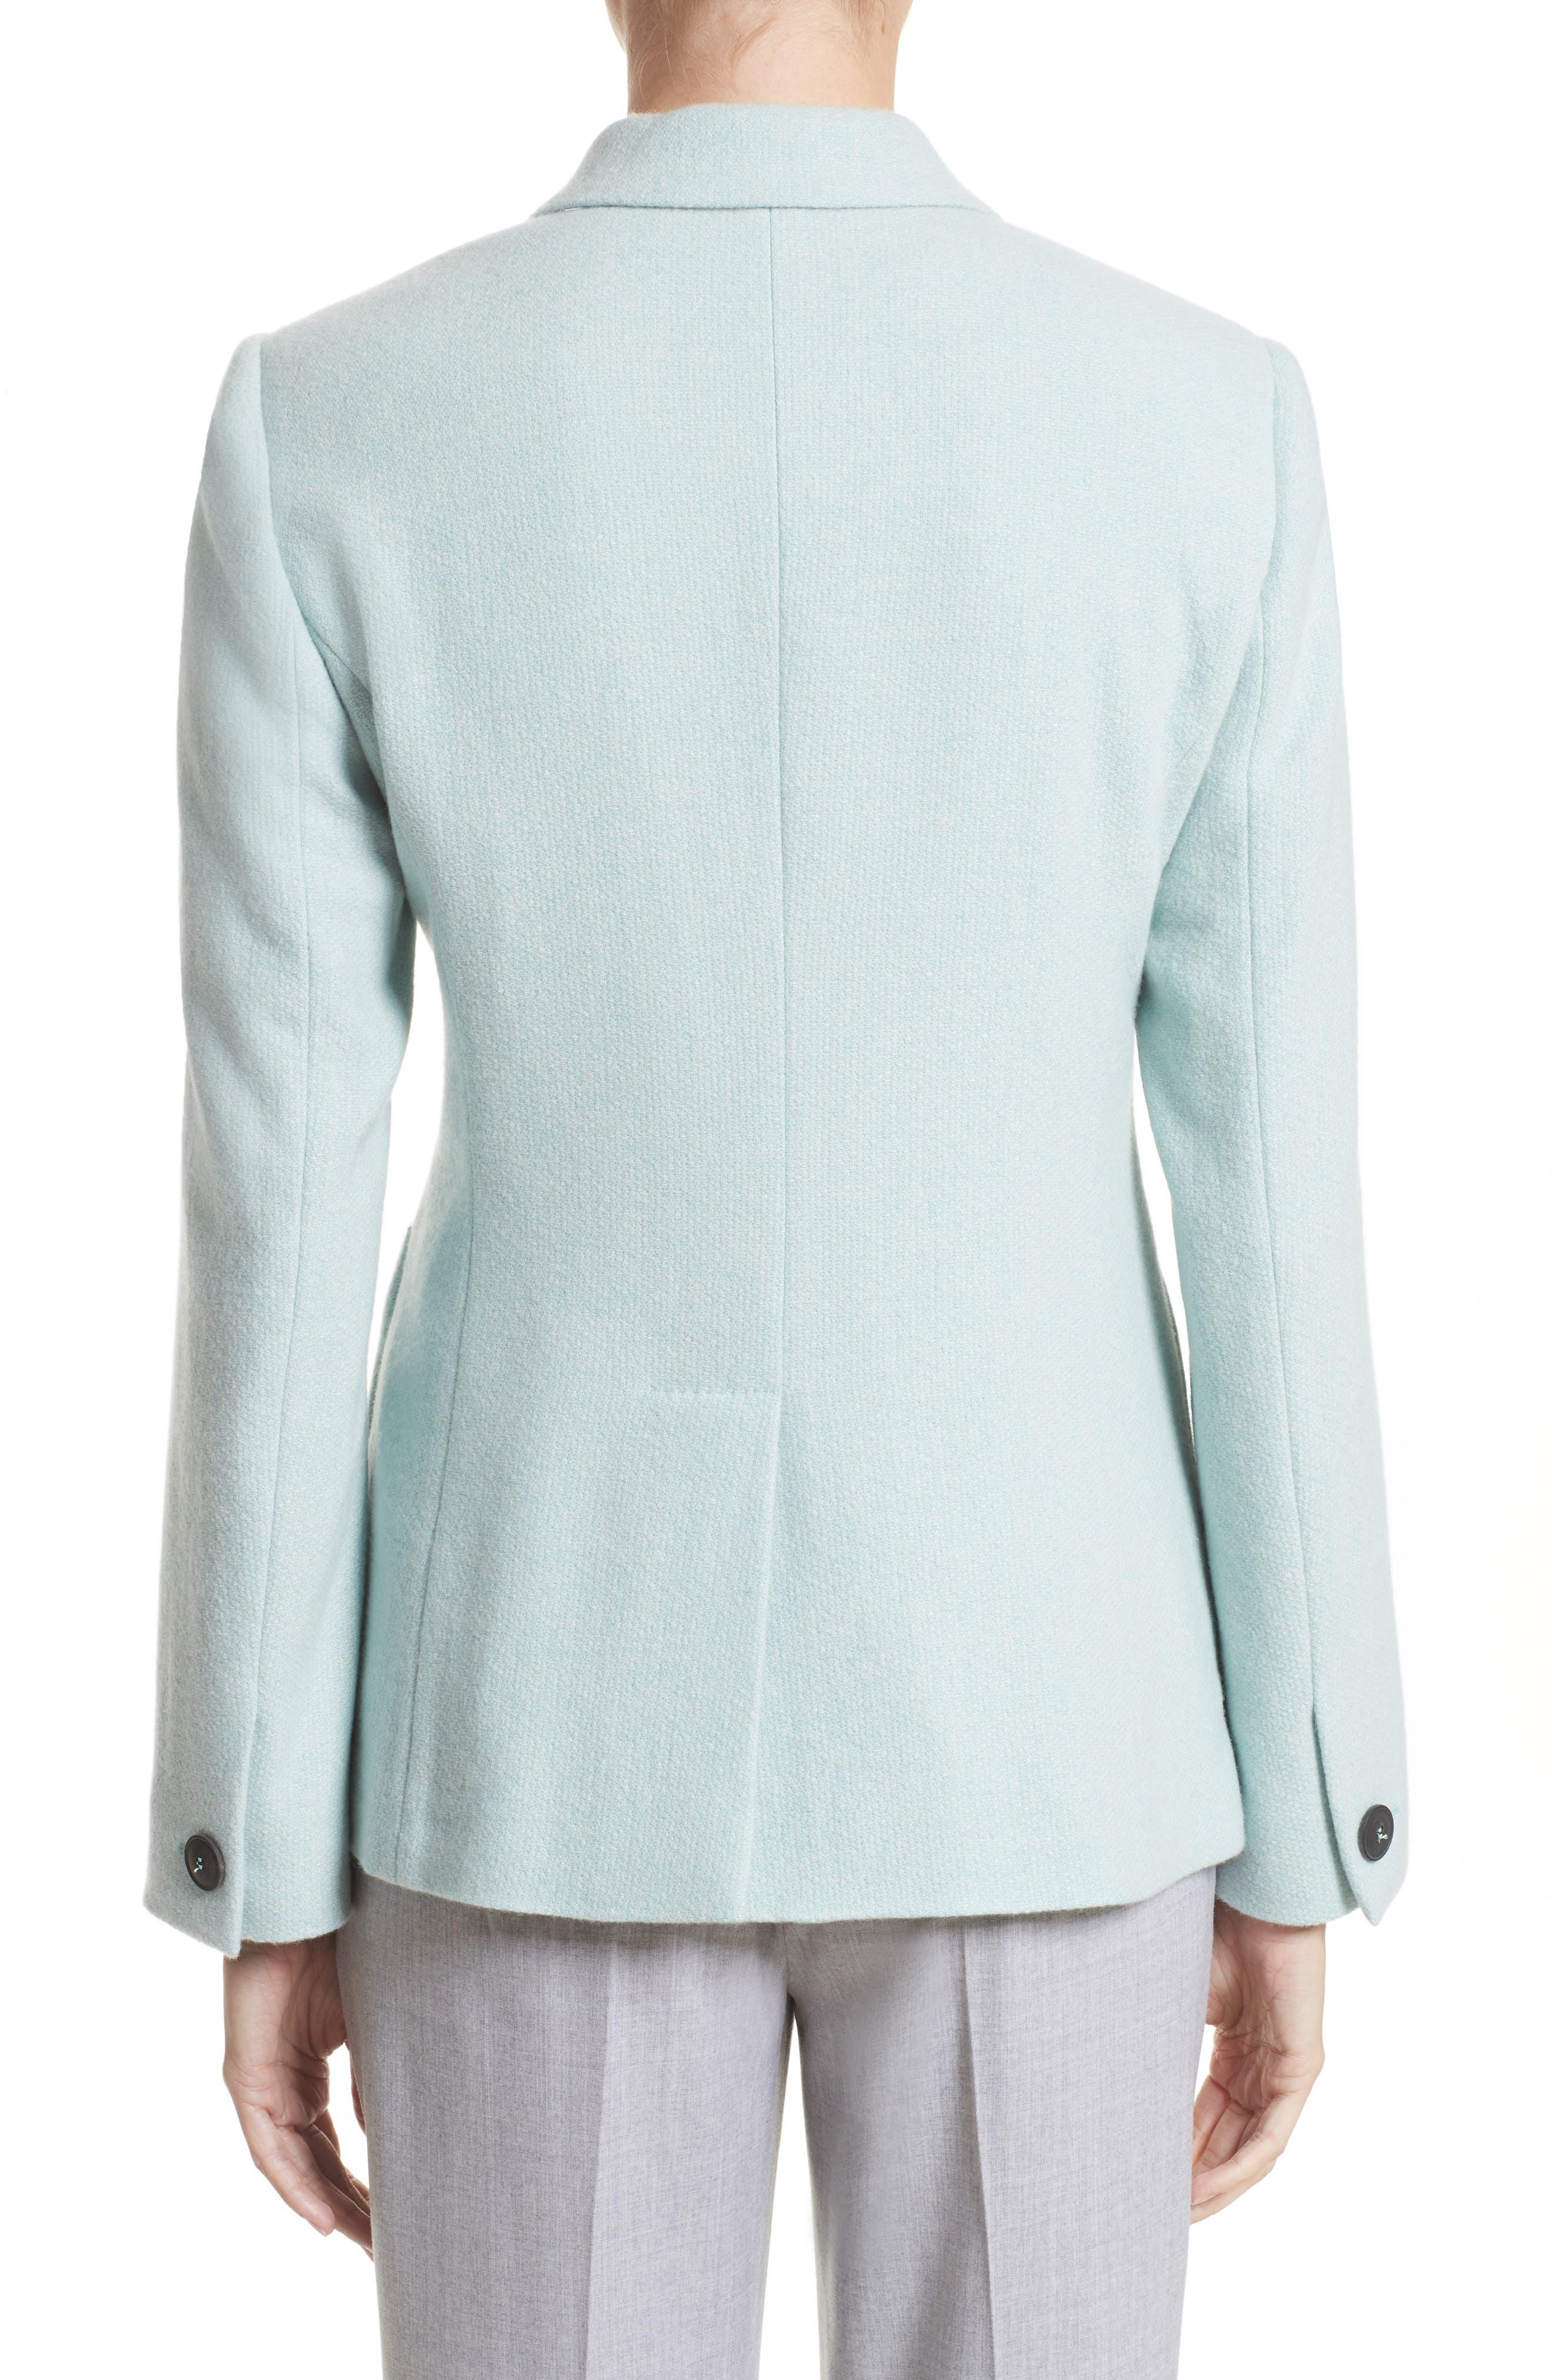 Pola Cashmere Jacket,                             Alternate thumbnail 2, color,                             Water